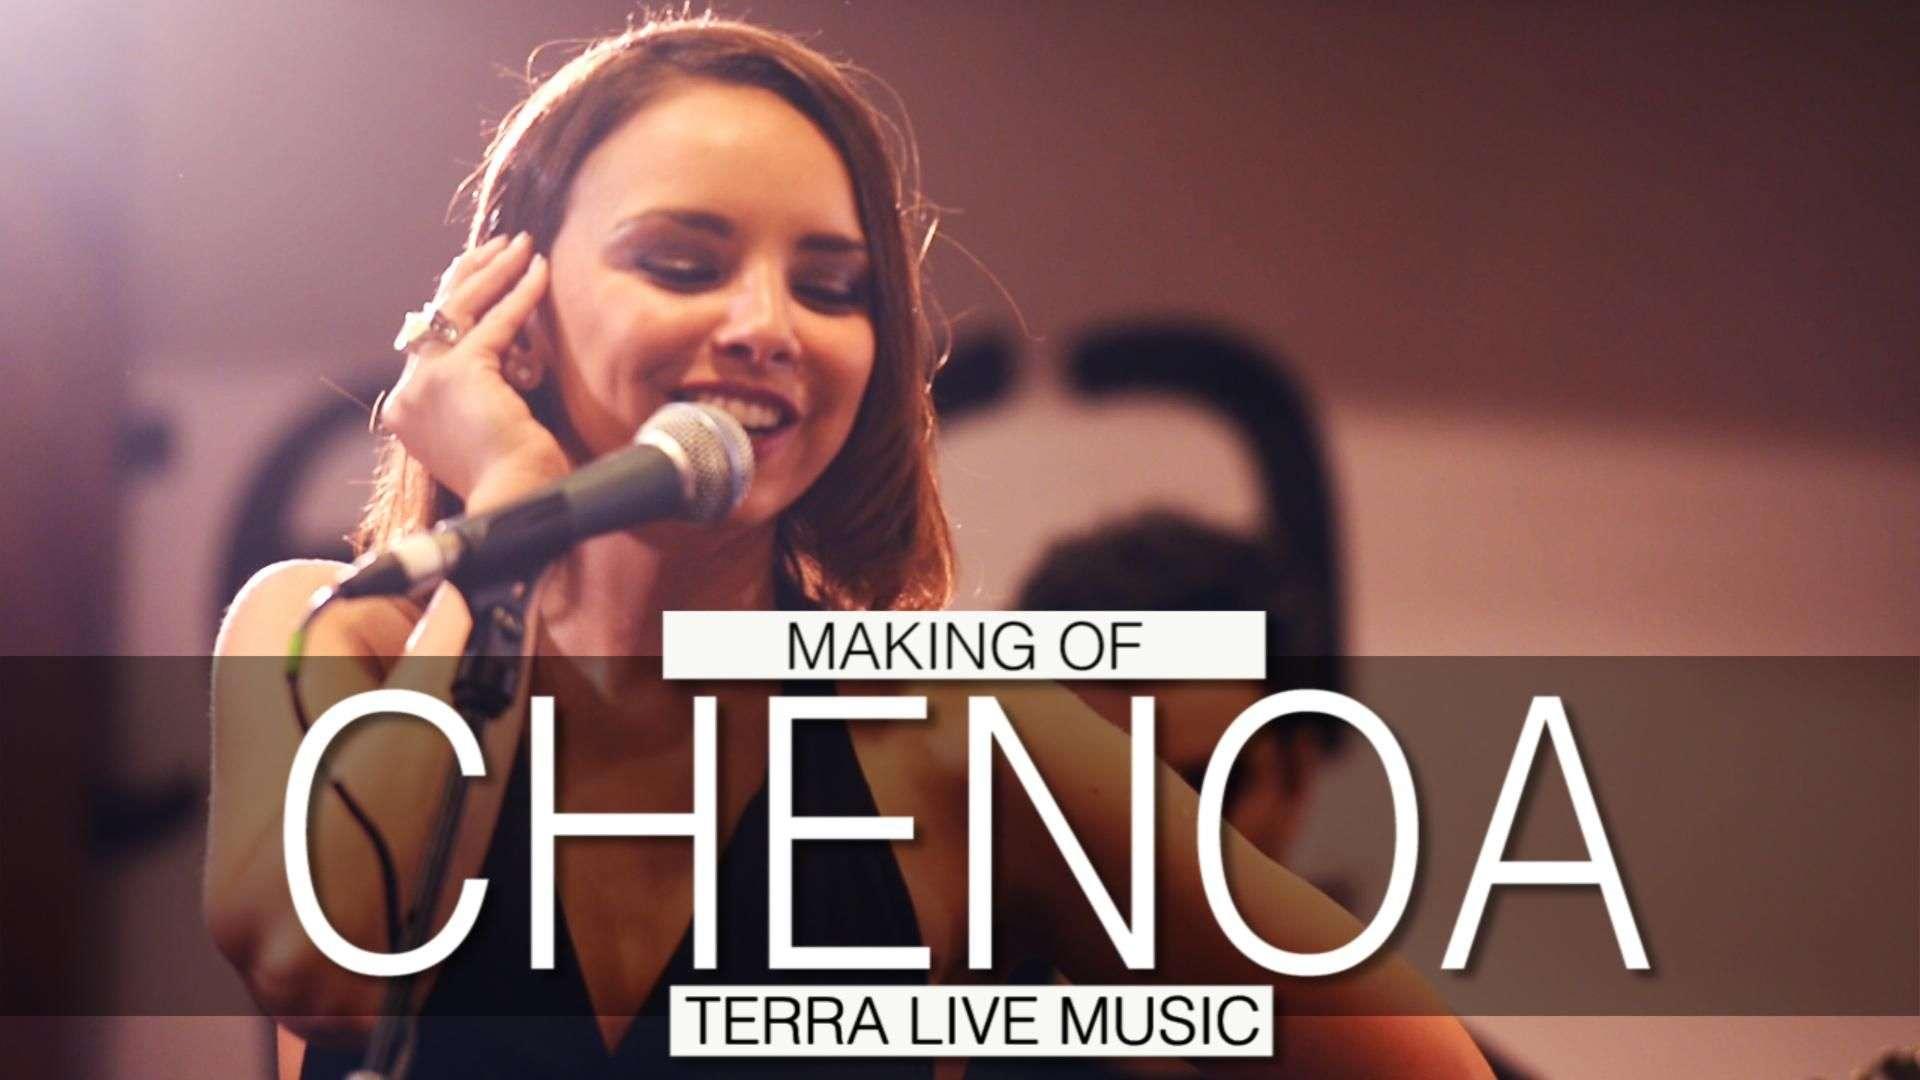 Making of del showcase de Chenoa en Terra Live Music